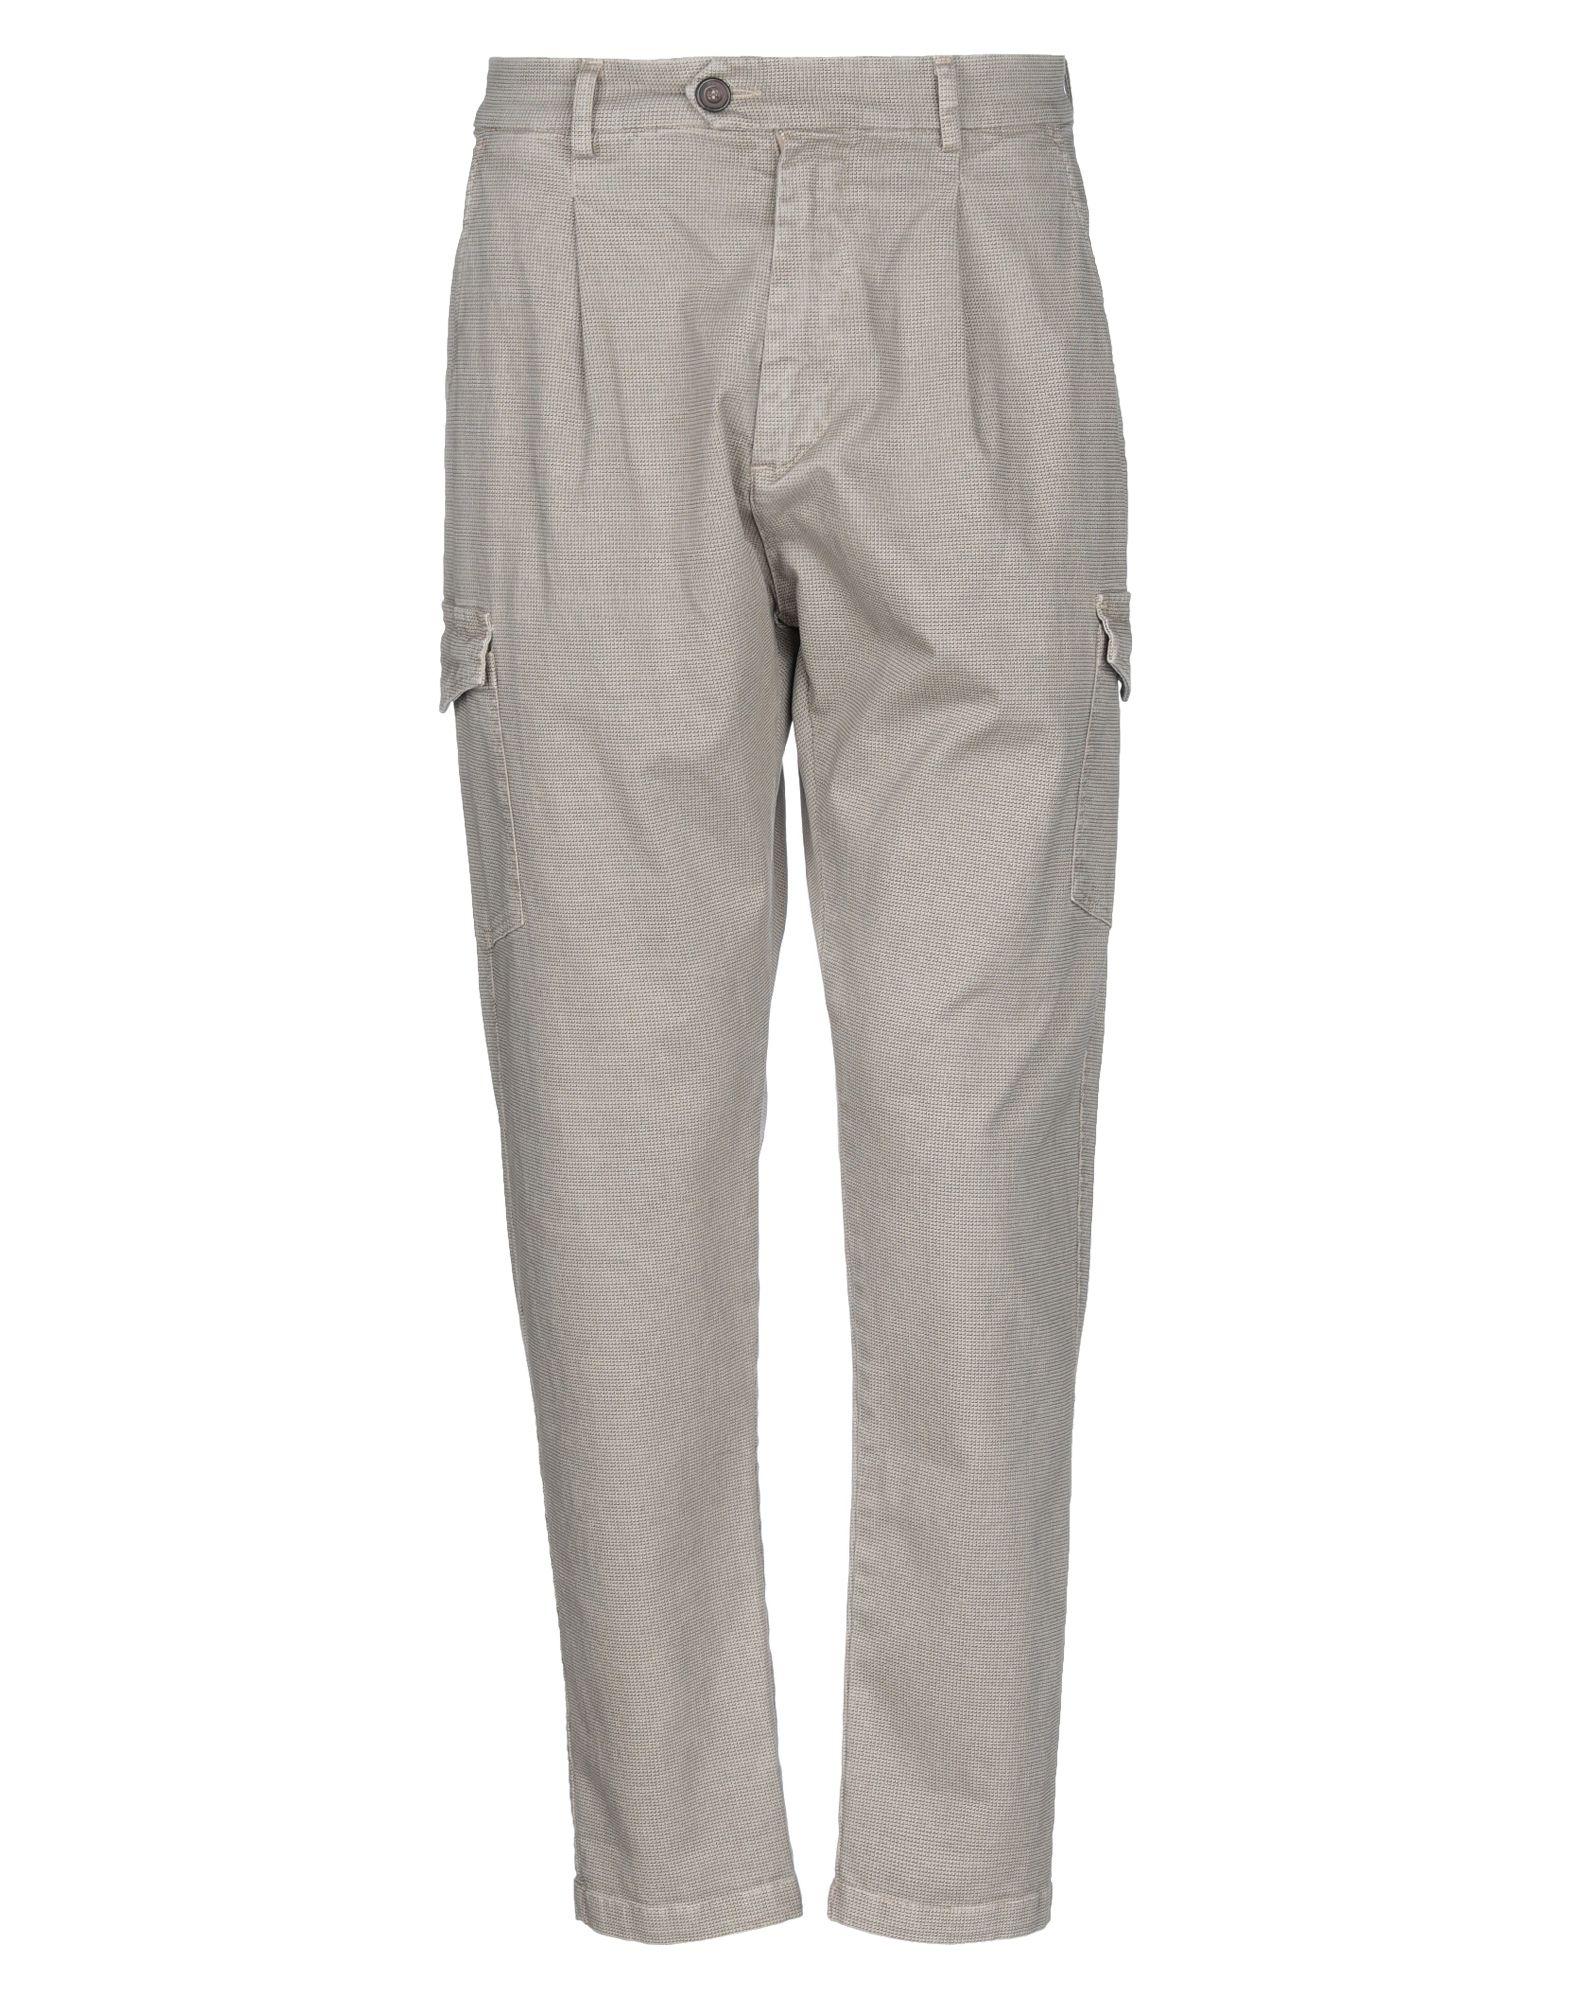 HOMEWARD CLOTHES Повседневные брюки homeward clothes кардиган